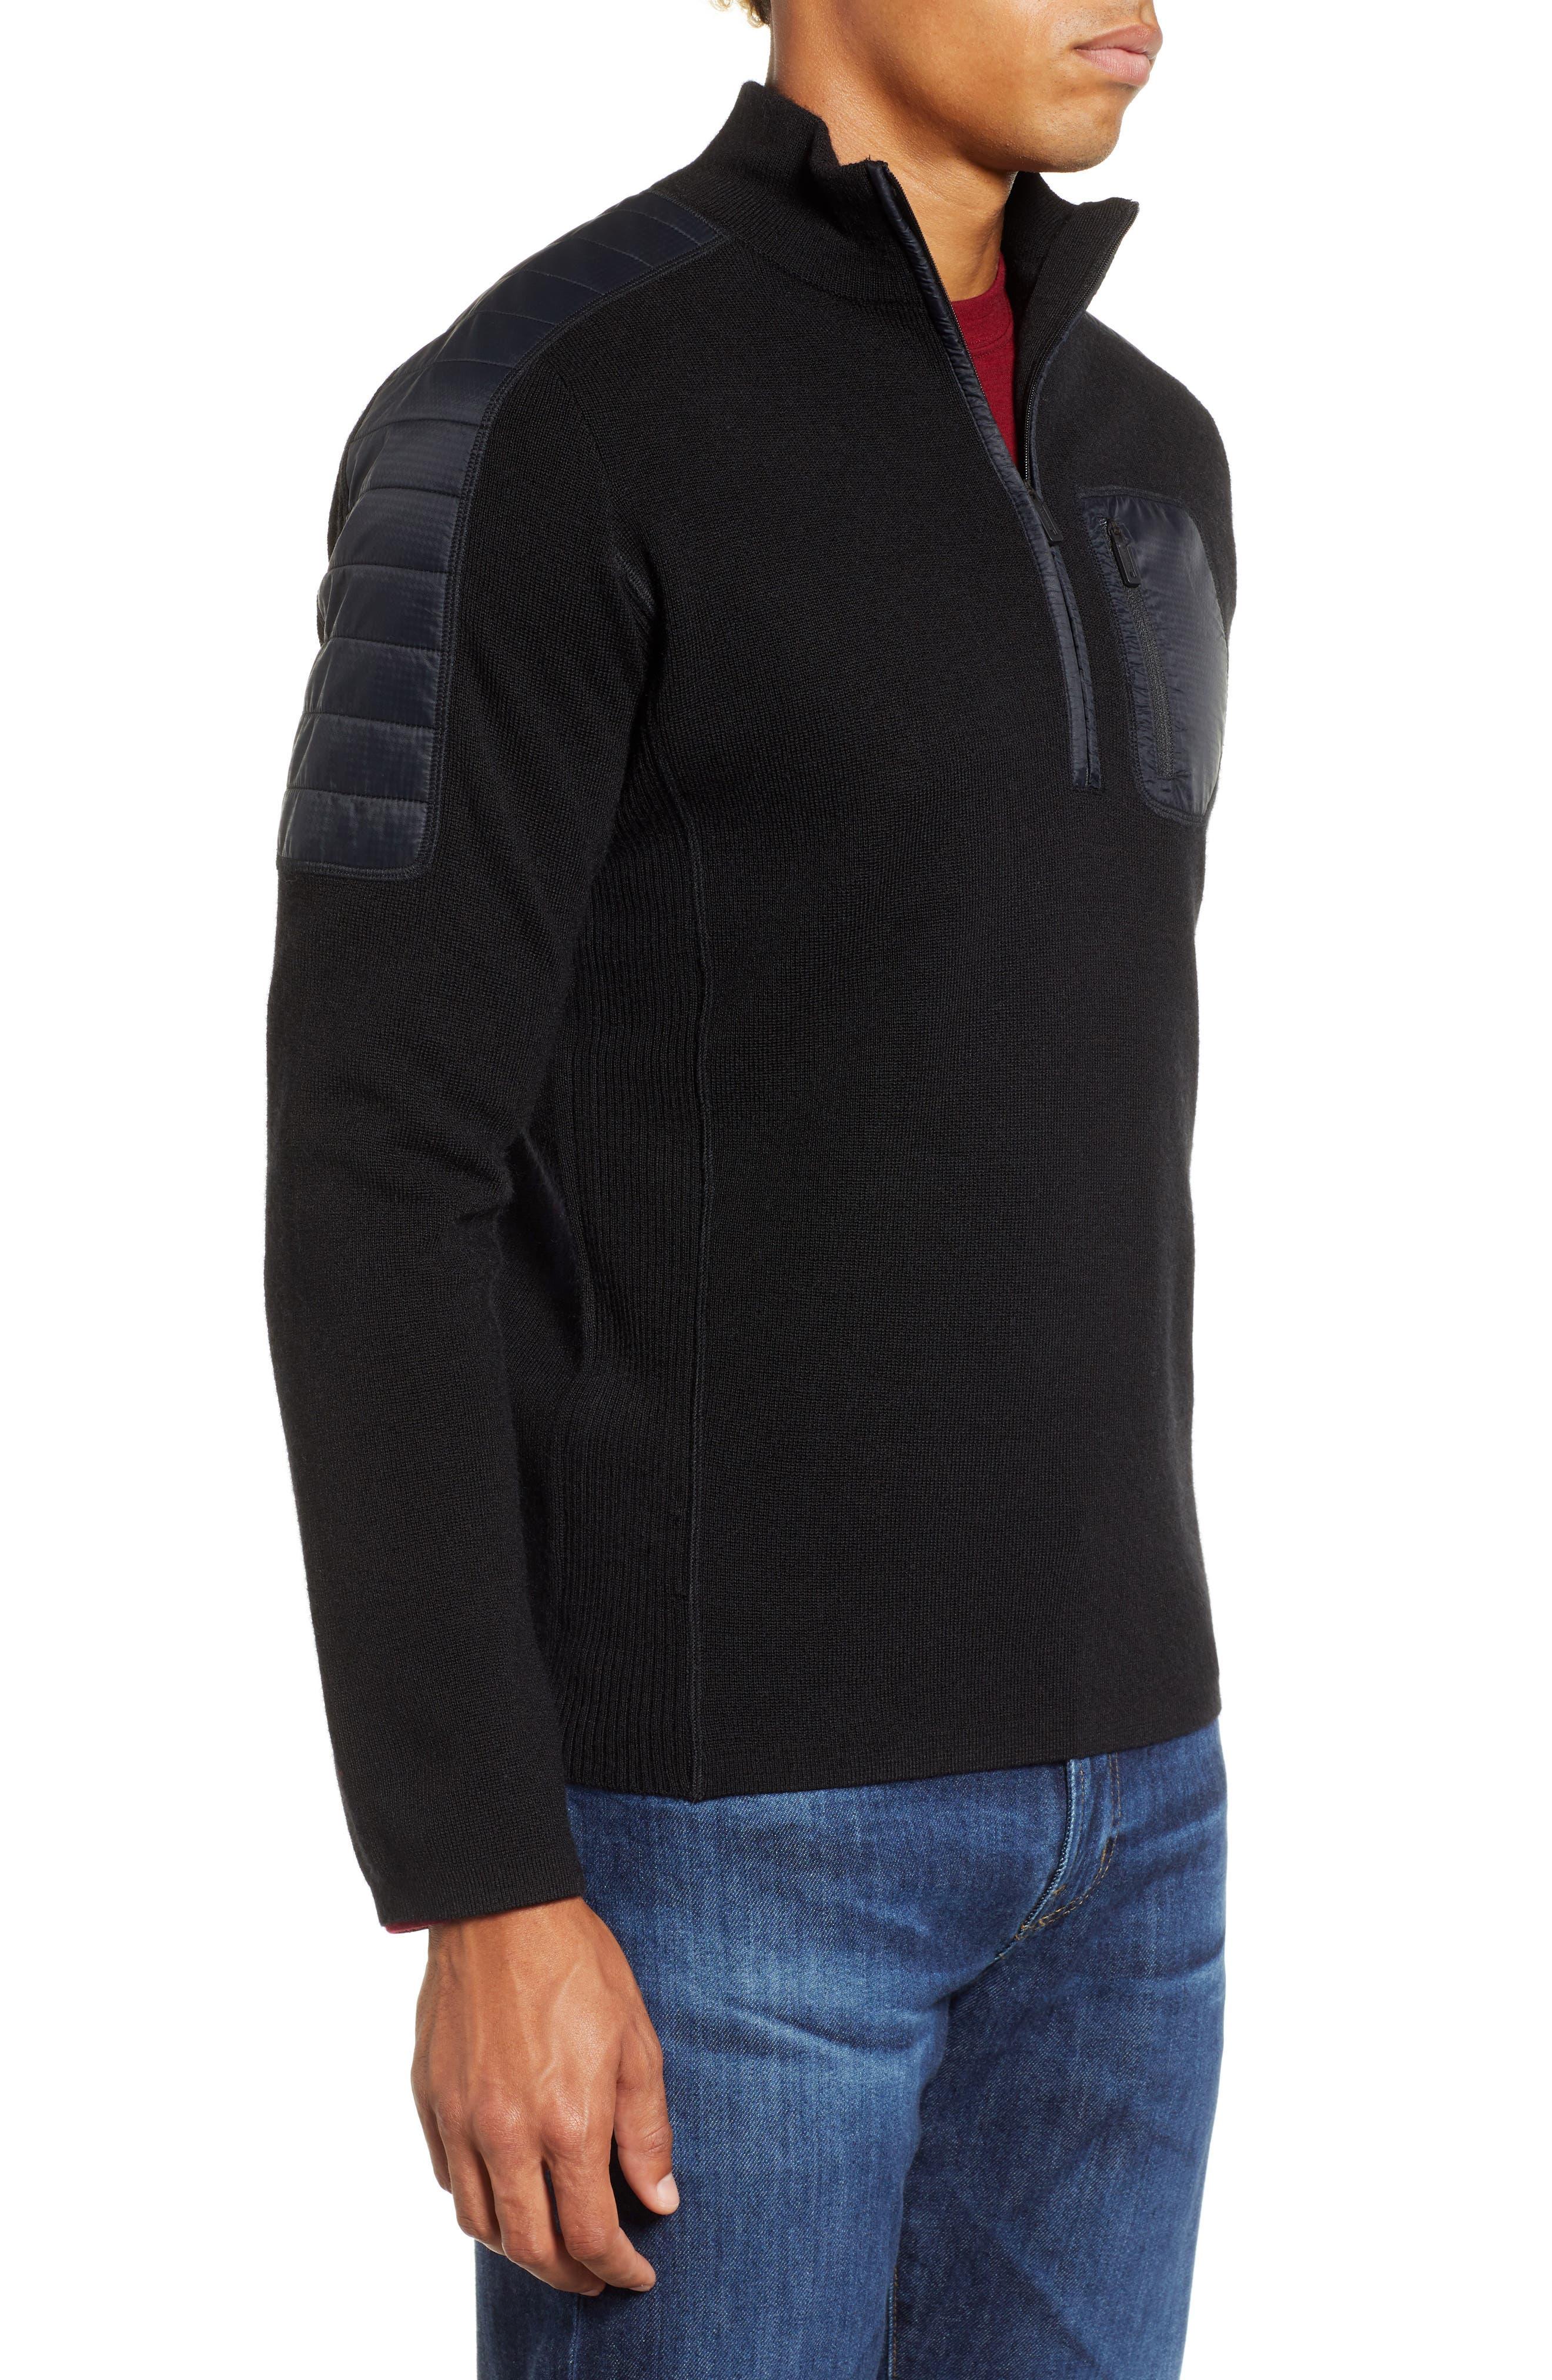 SMARTWOOL,                             Ski Ninja Pullover Sweater,                             Alternate thumbnail 3, color,                             BLACK